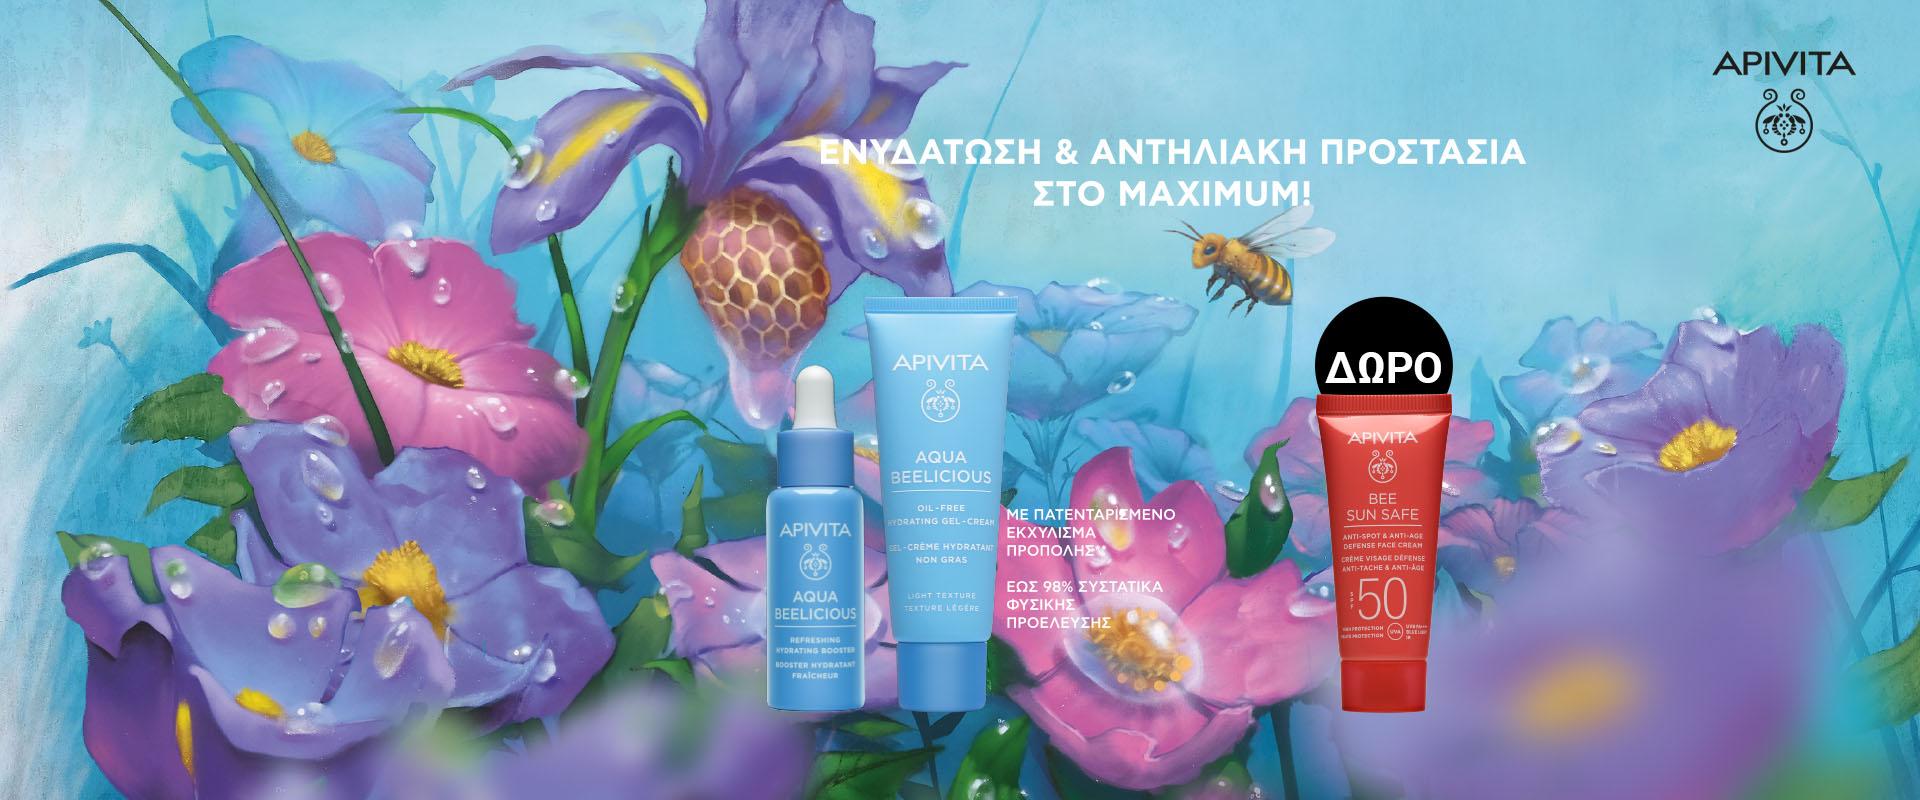 Apivita Aqua Beelicious με -40%